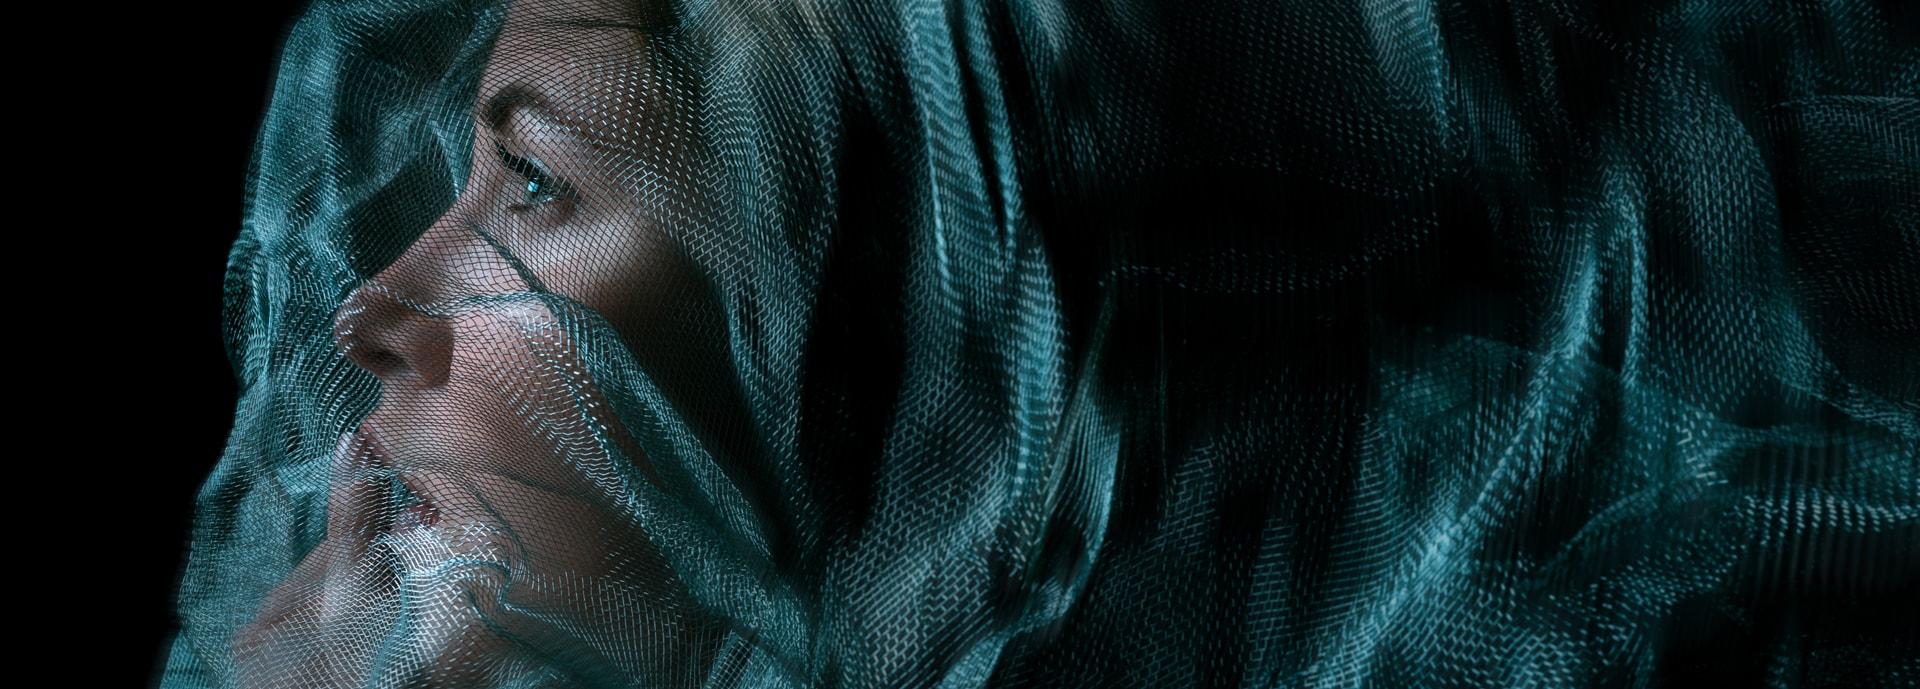 michamachtfotos.de Michael Bartz Fotografie